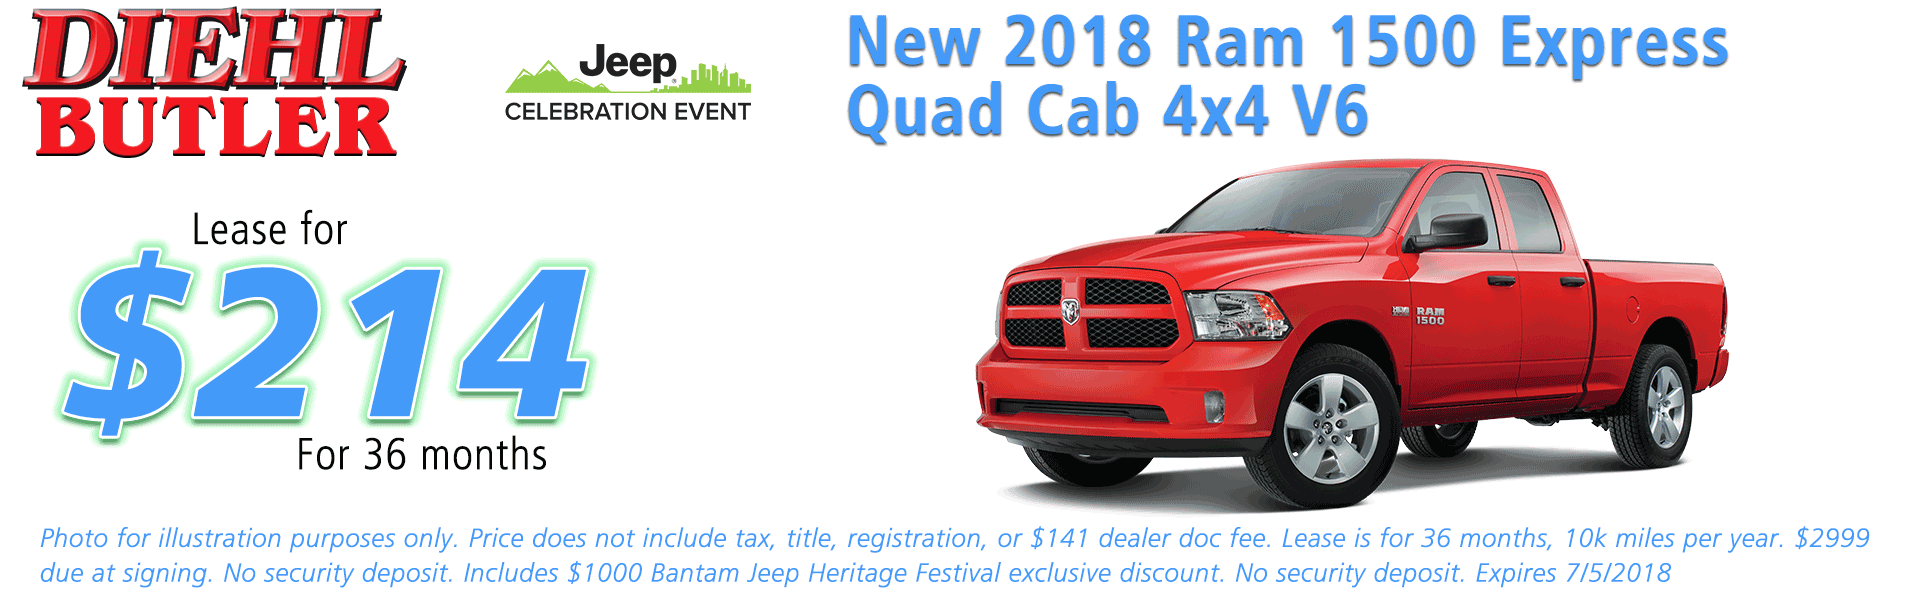 NEW 2018 RAM 1500 EXPRESS QUAD CAB® 4X4 6'4